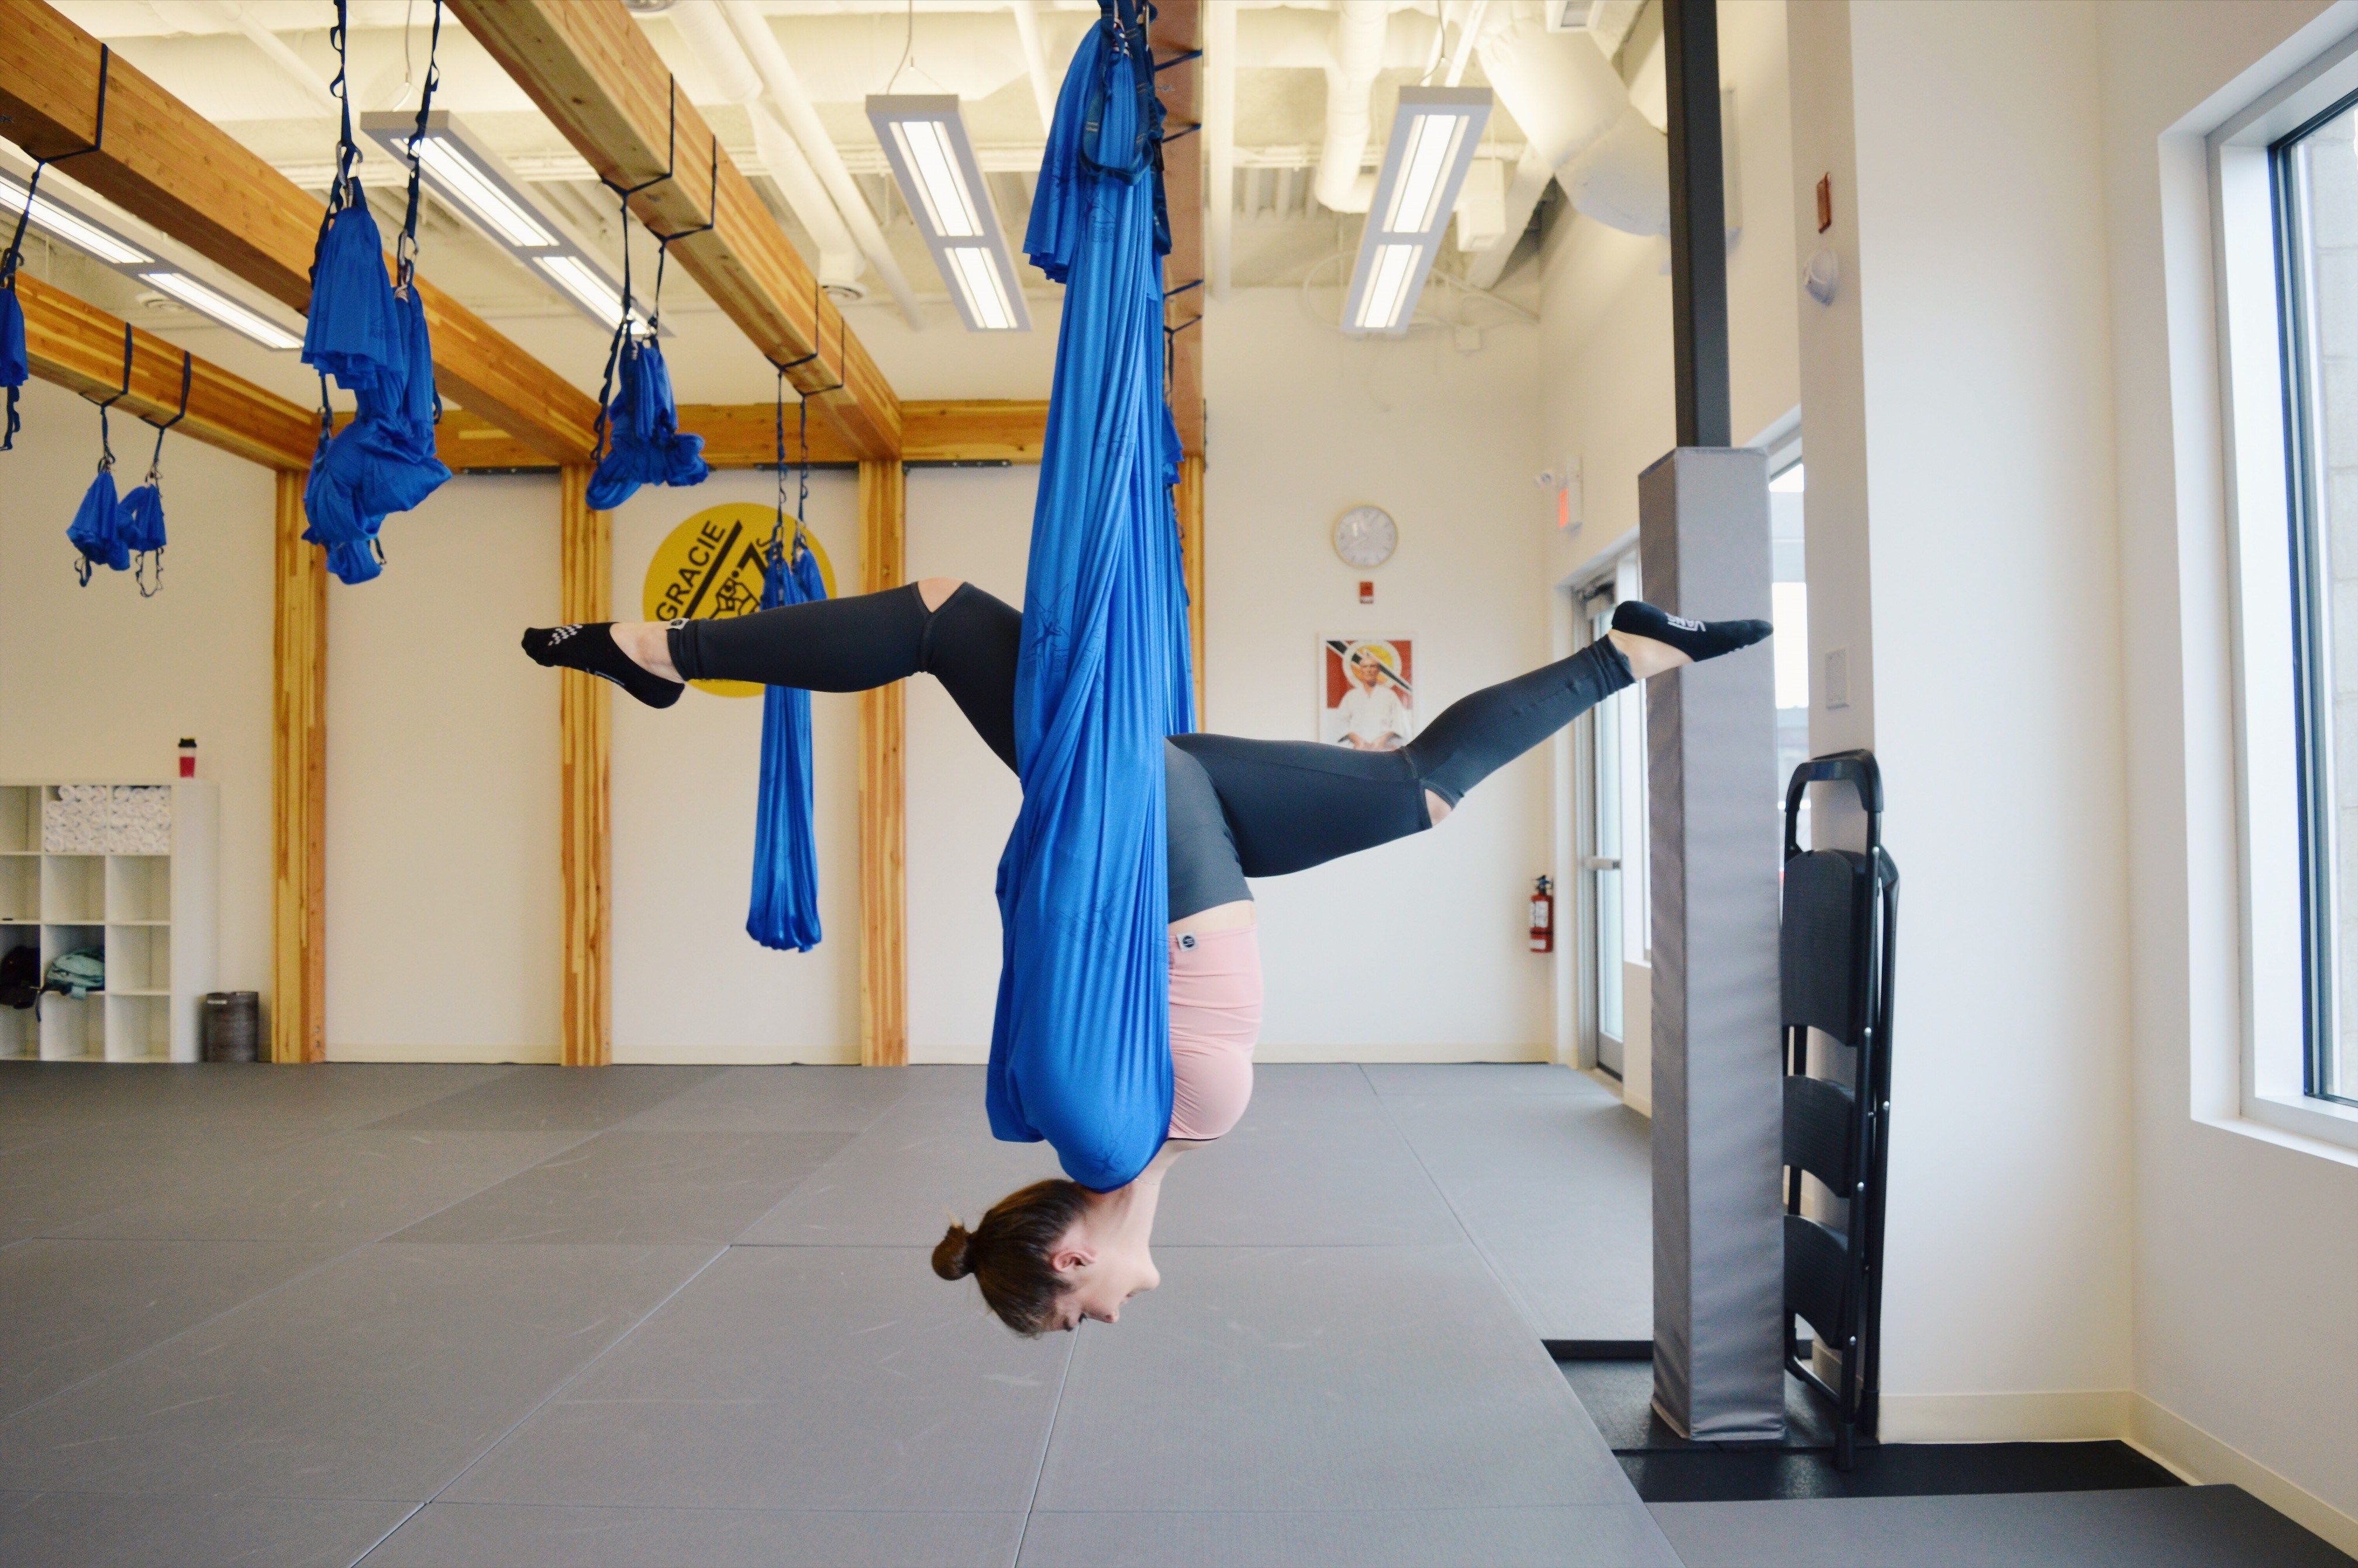 Aerial Yoga At Inflight Fitness Calgary Ab Aerial Yoga Aerial Yoga Classes Fitness